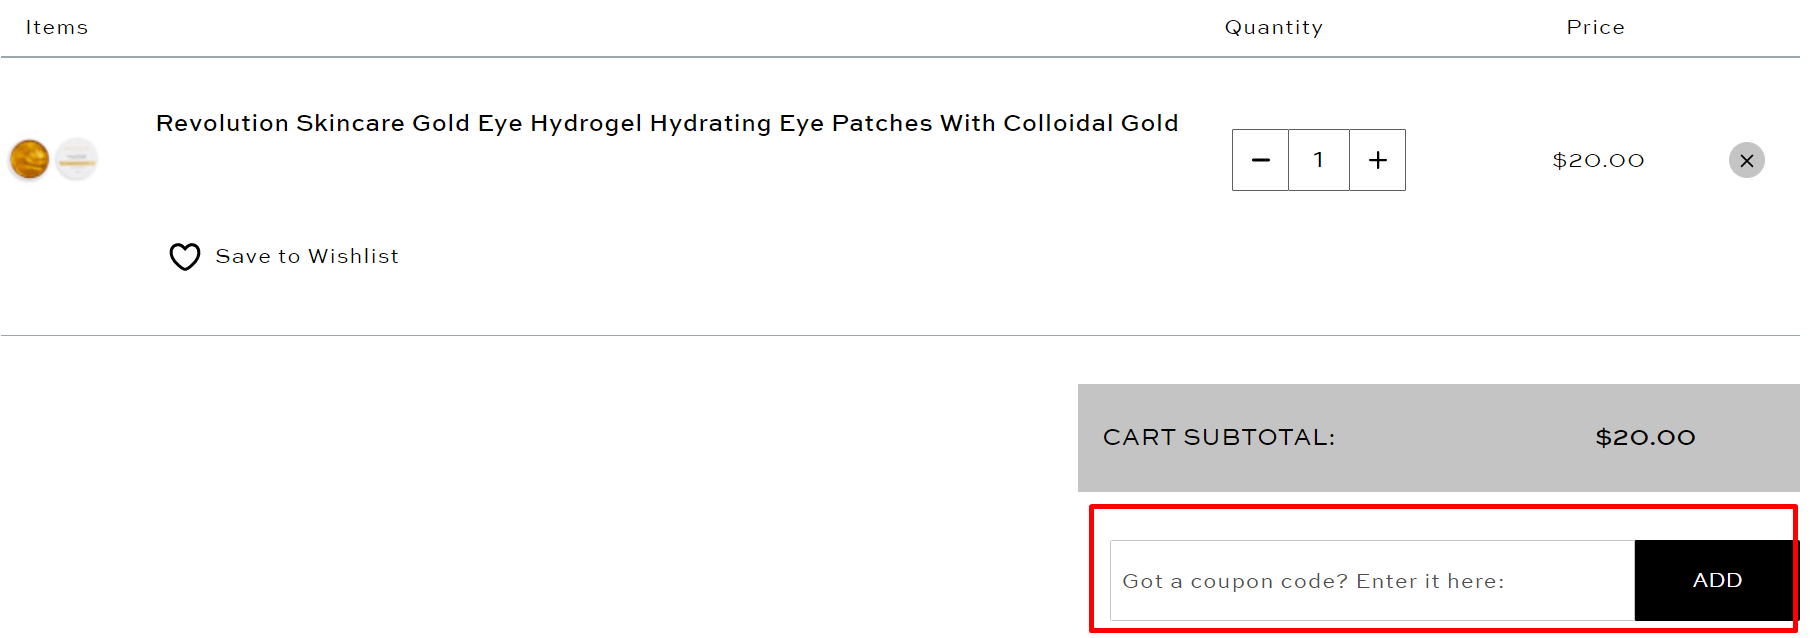 How do I use my Revolution Beauty coupon code?